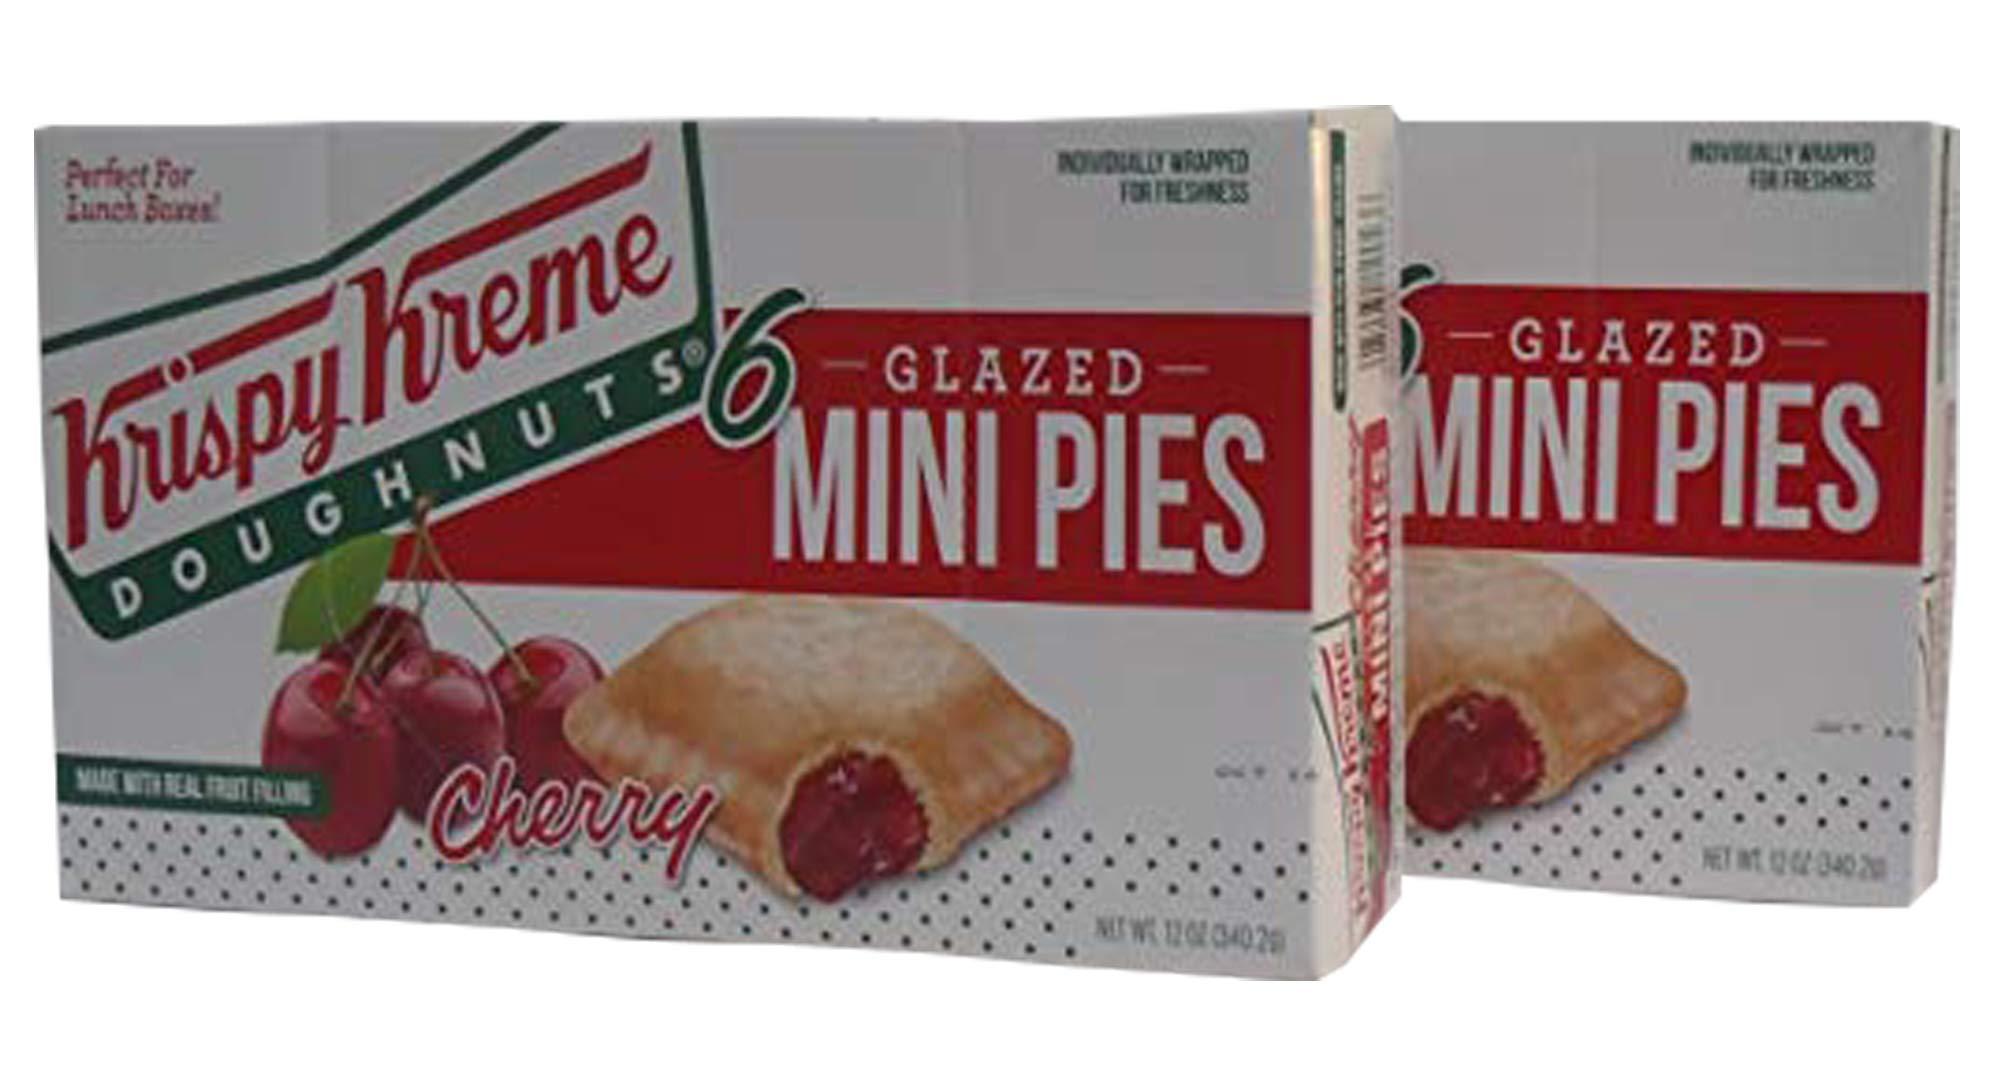 Krispy Kreme Glazed Mini Pies - 6-2 oz Glazed Mini Pies Per Box - Two Boxes: Cherry